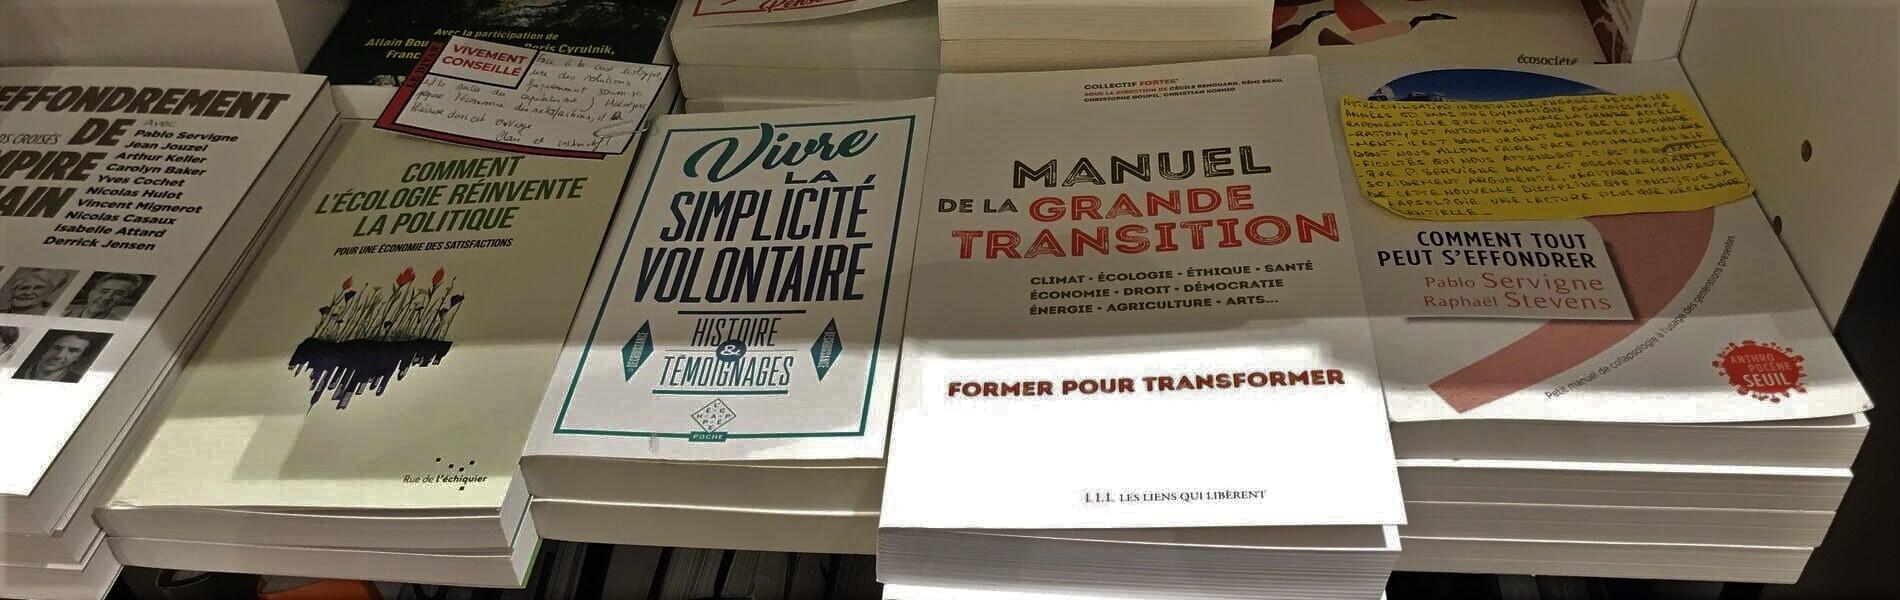 Le Manuel de la Grande Transition